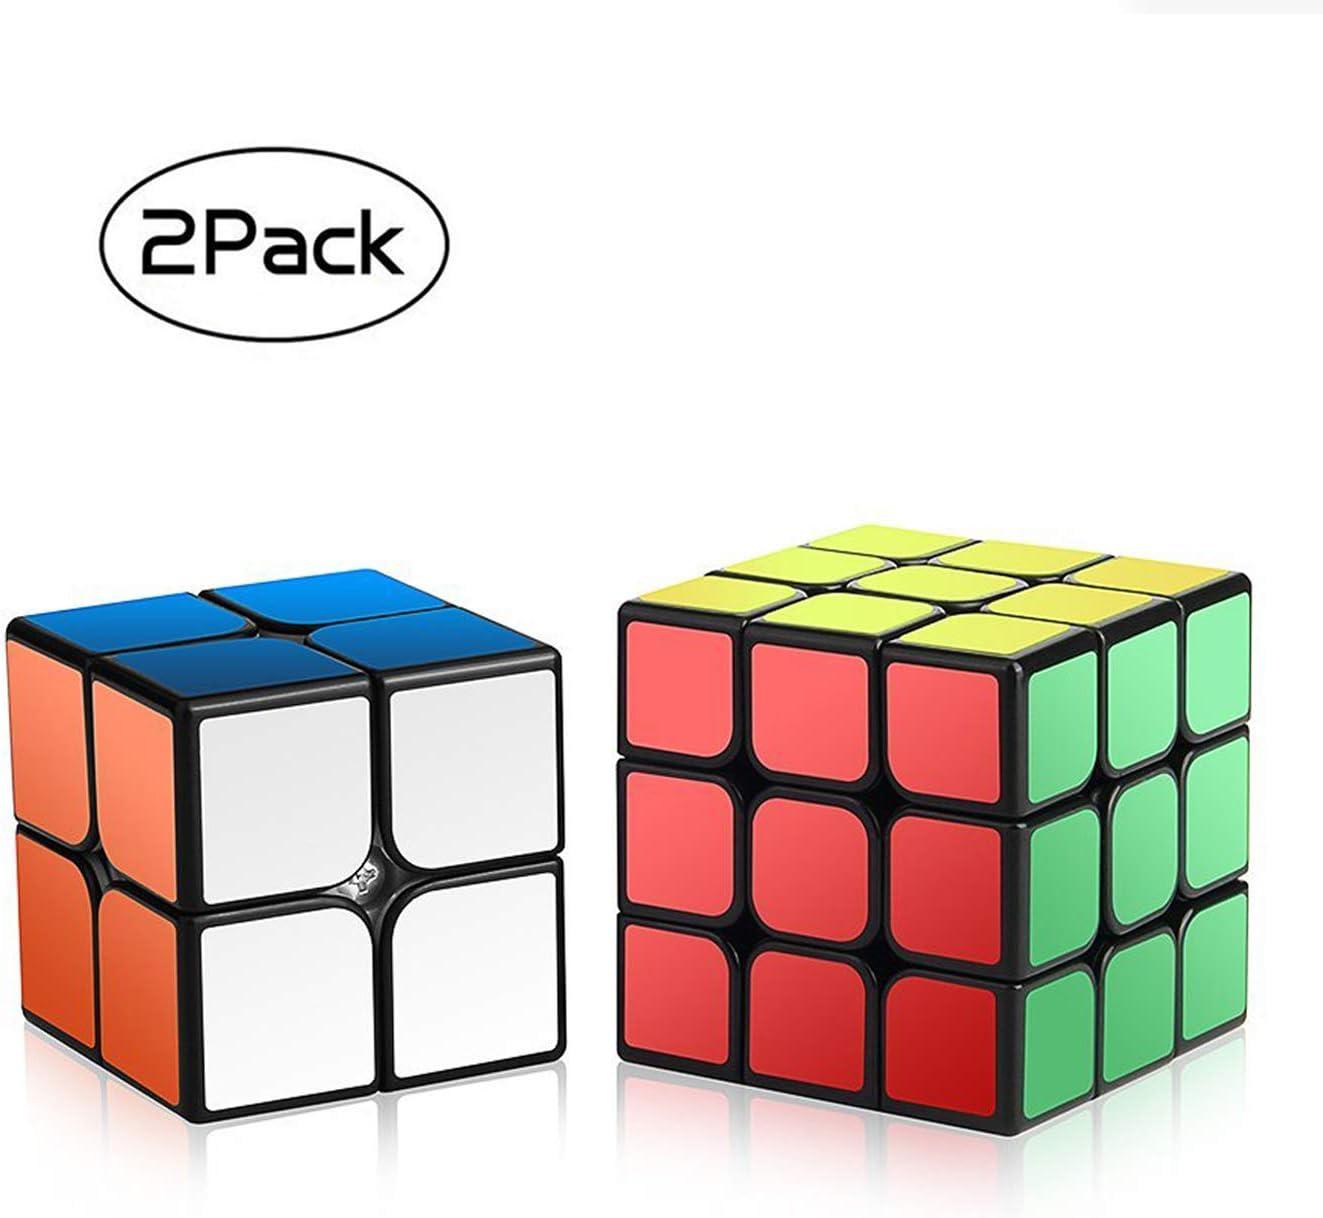 ROXENDA Speed Cube Set, Magic Cube Set of 2x2x2 3x3x3 Cube Smooth Puzzle Cube